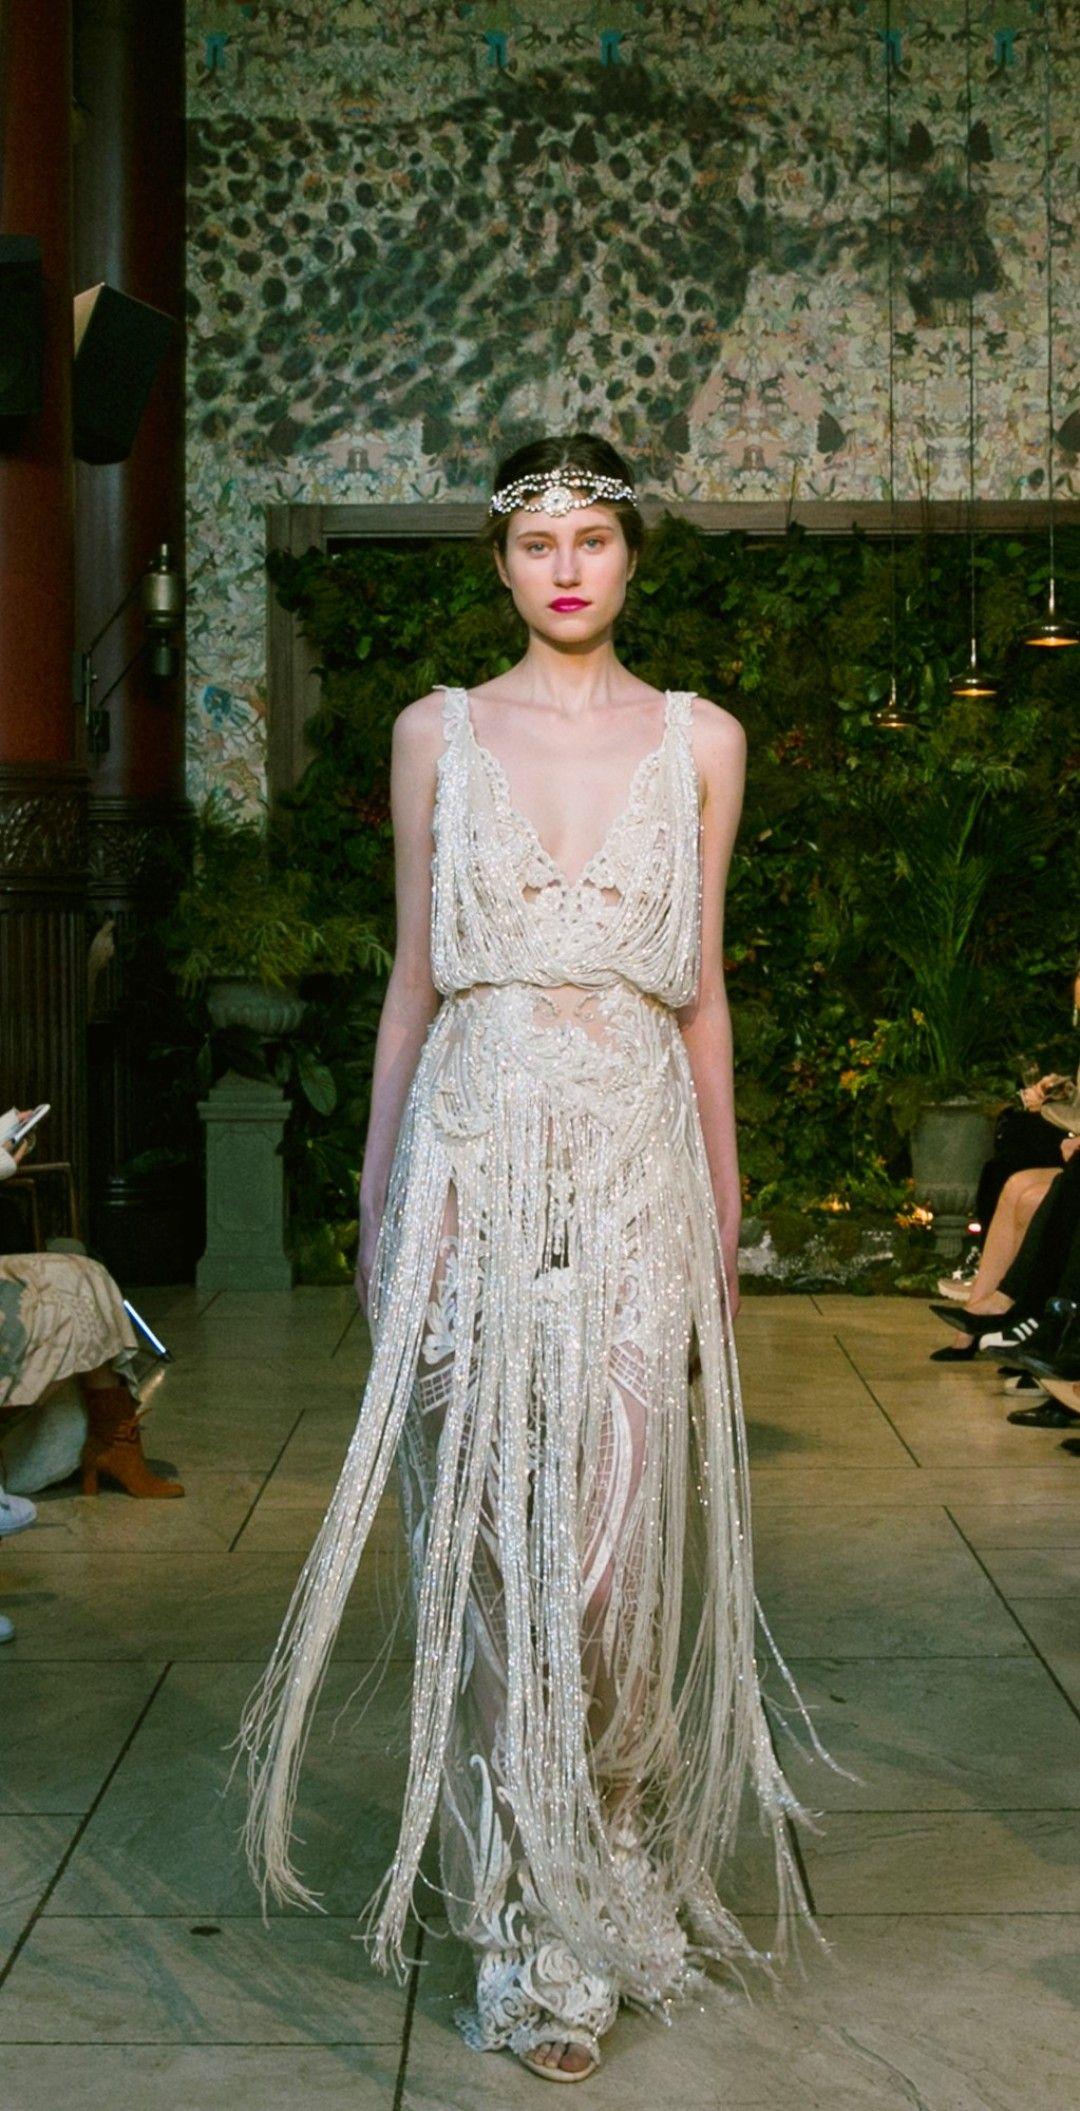 Tuvanam Bridal For Davetcokelbisemyok Incili Puskul Gelinlik 2020 The Dress Gelinlik Elbise